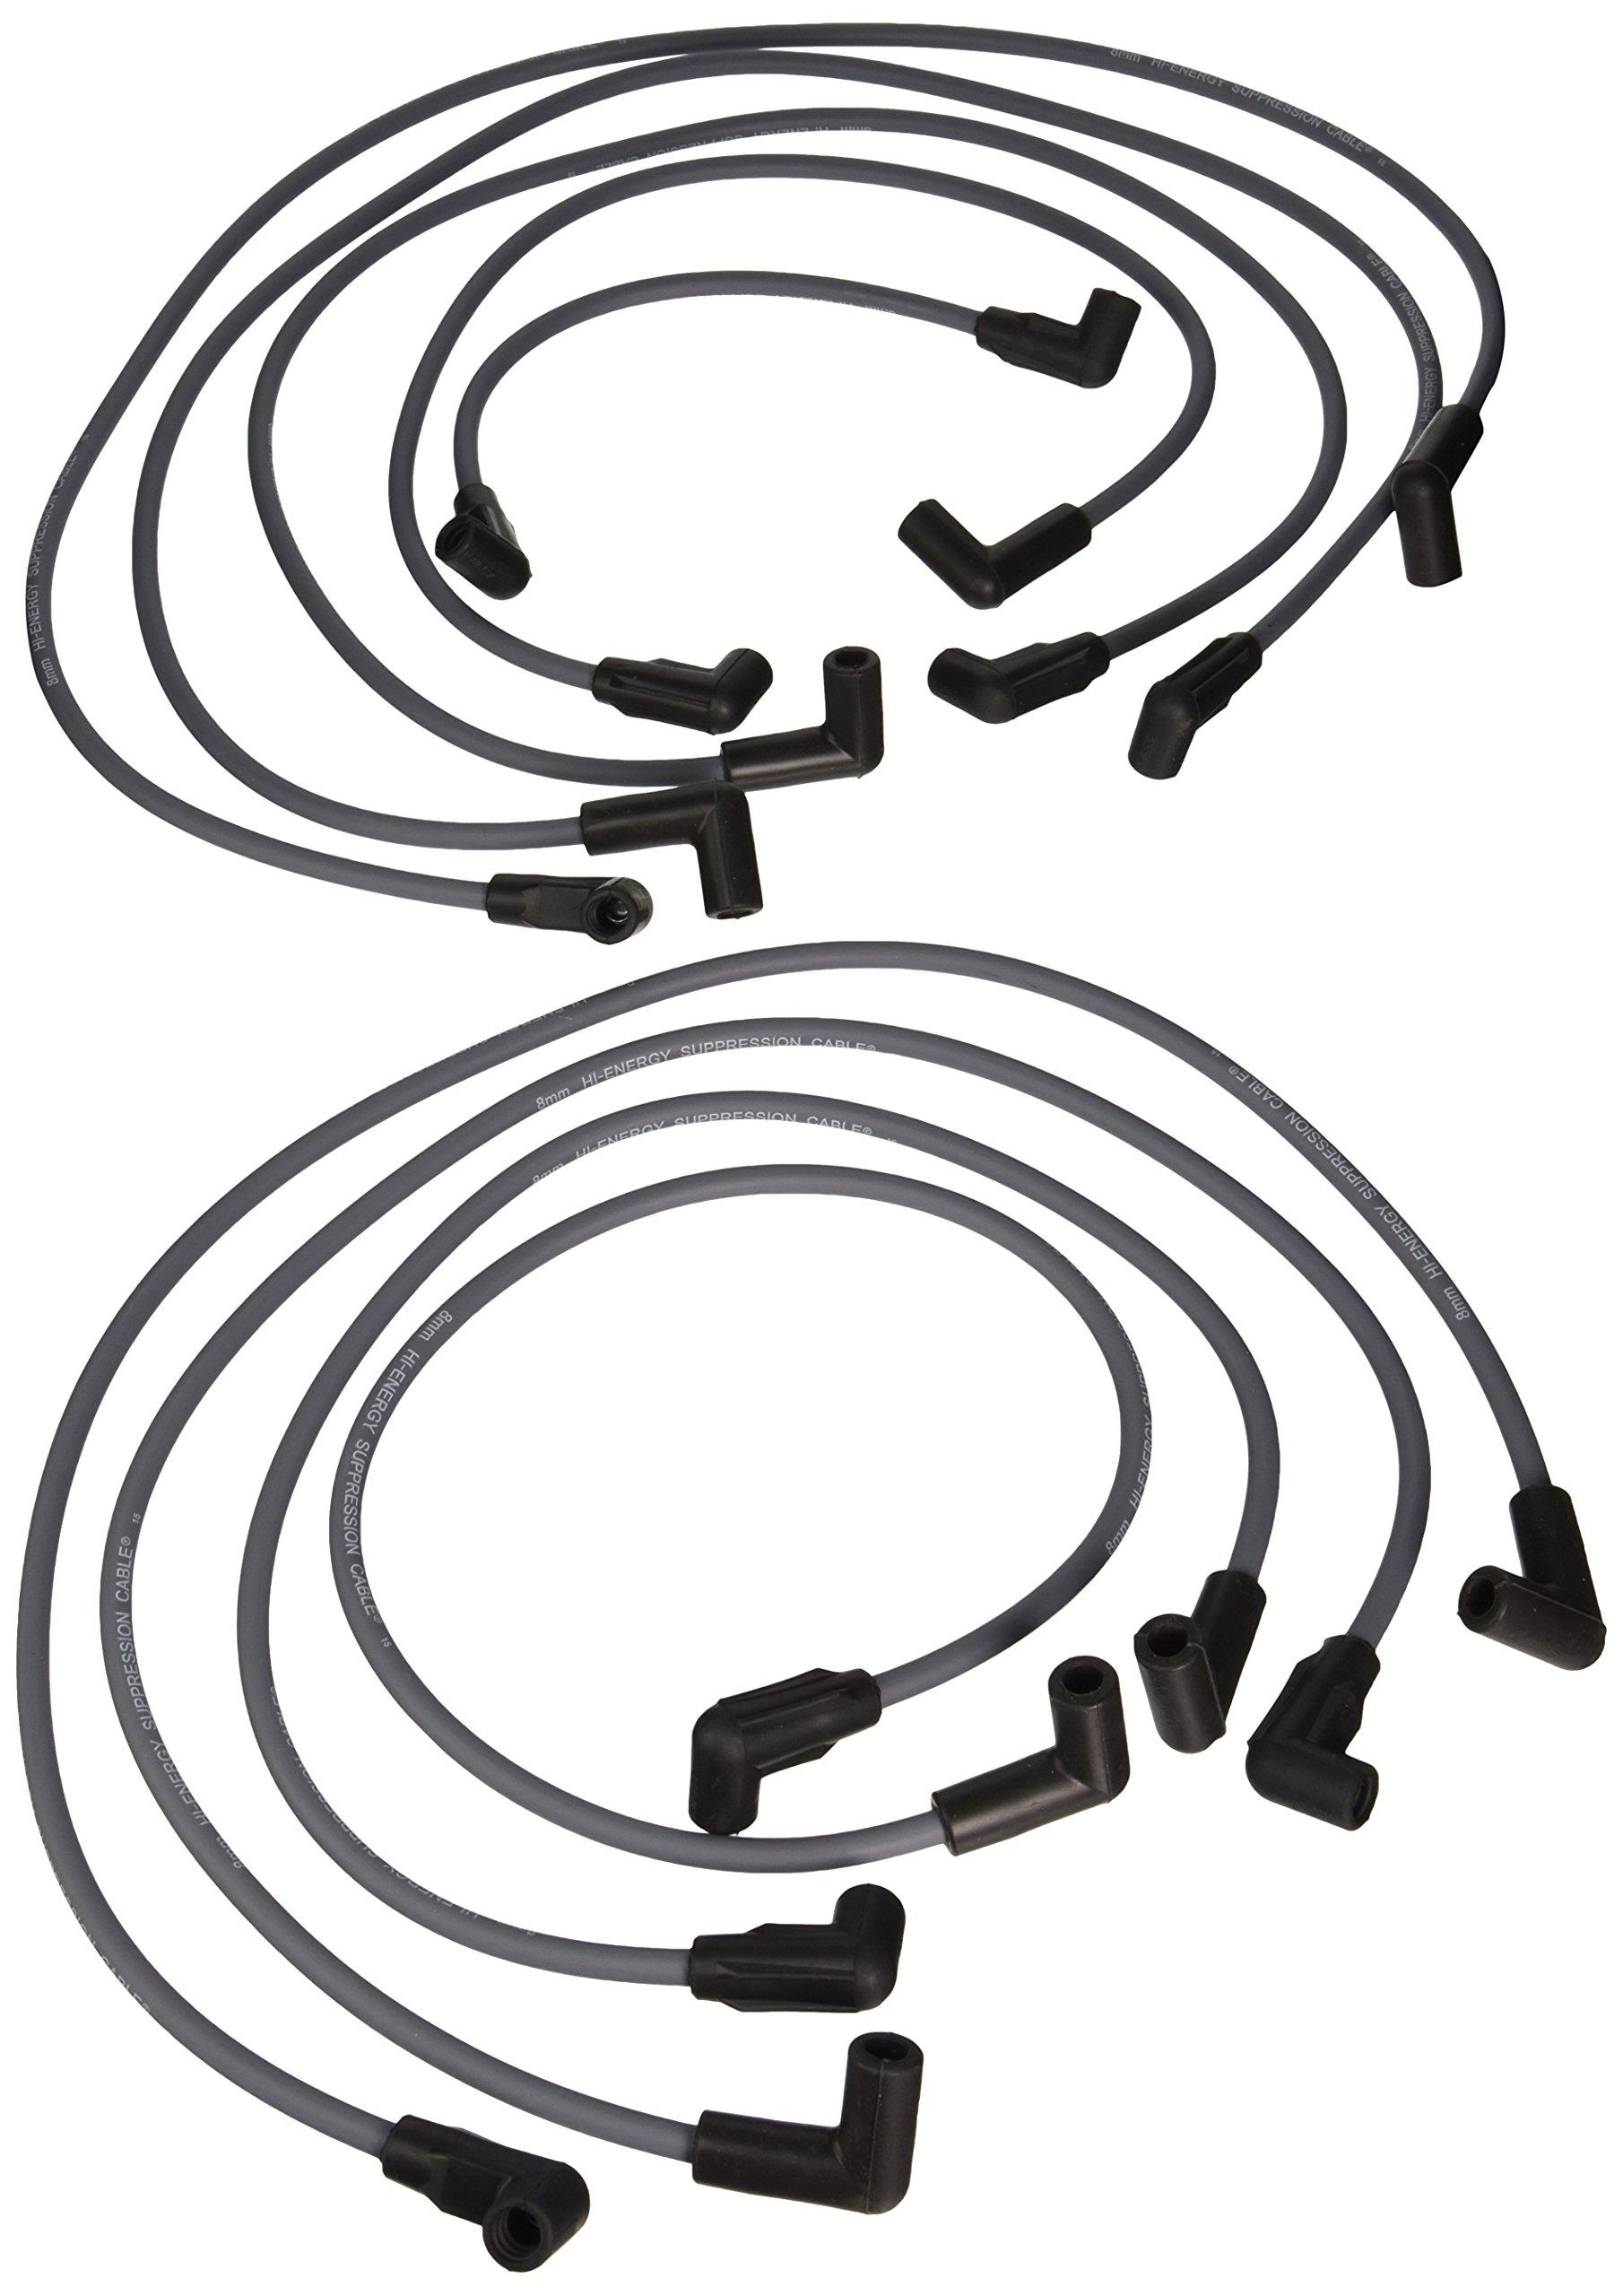 Federal Parts Spark Plug Wire Set